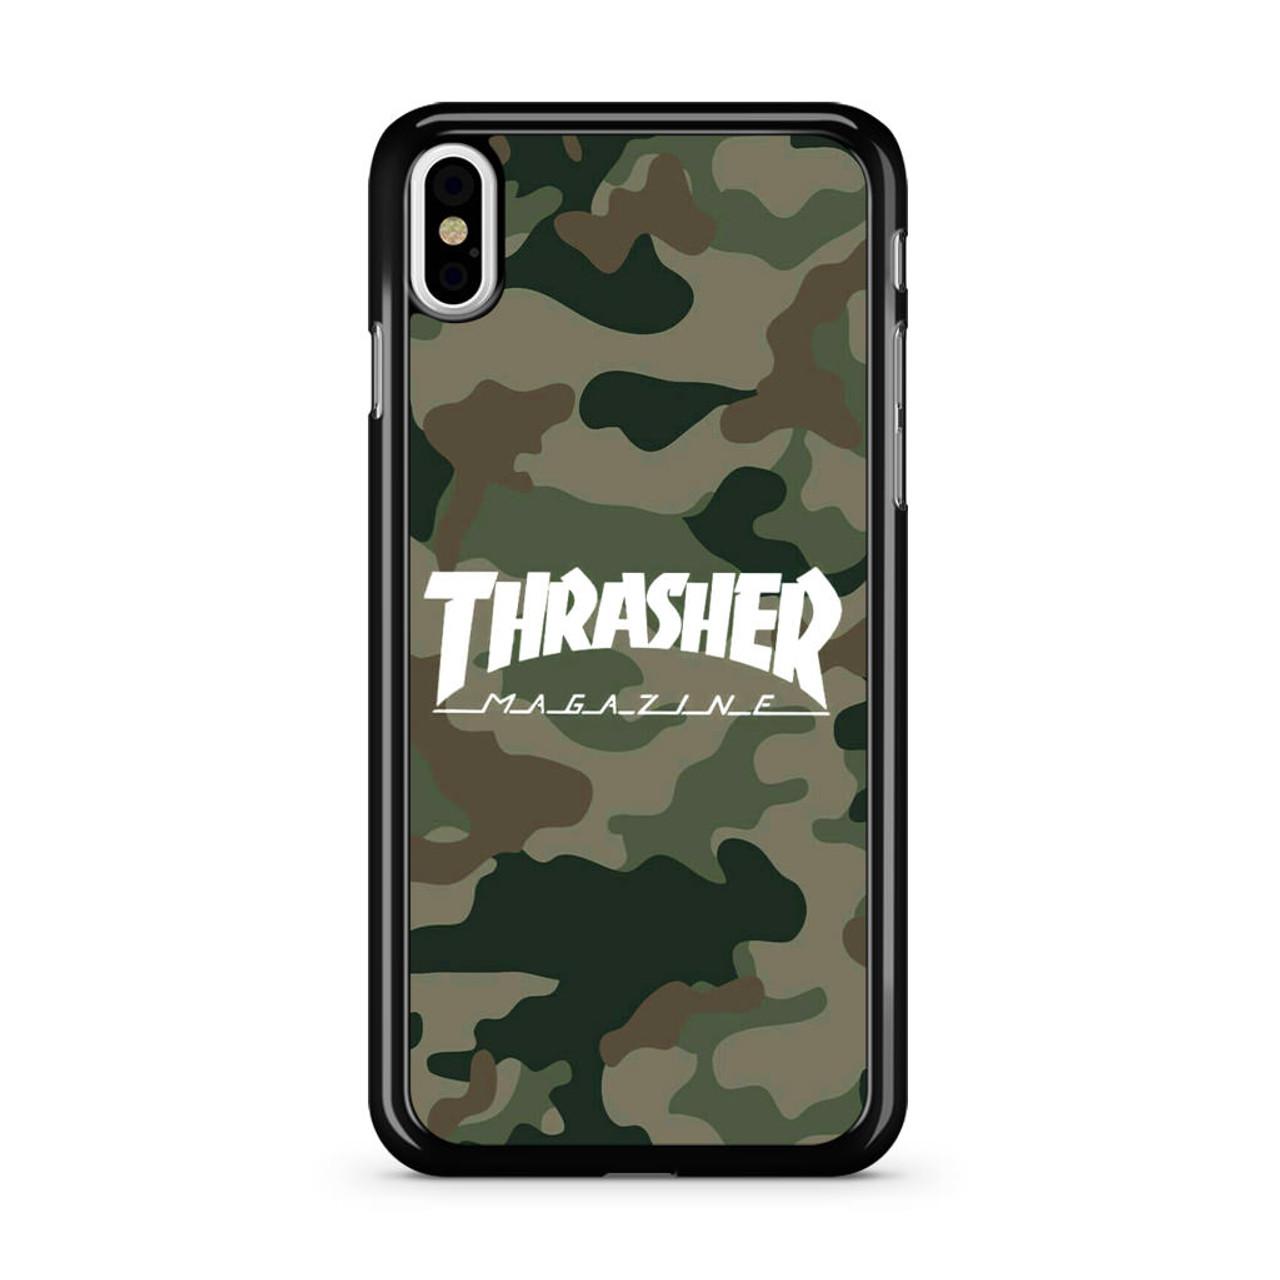 bape iphone xs max case